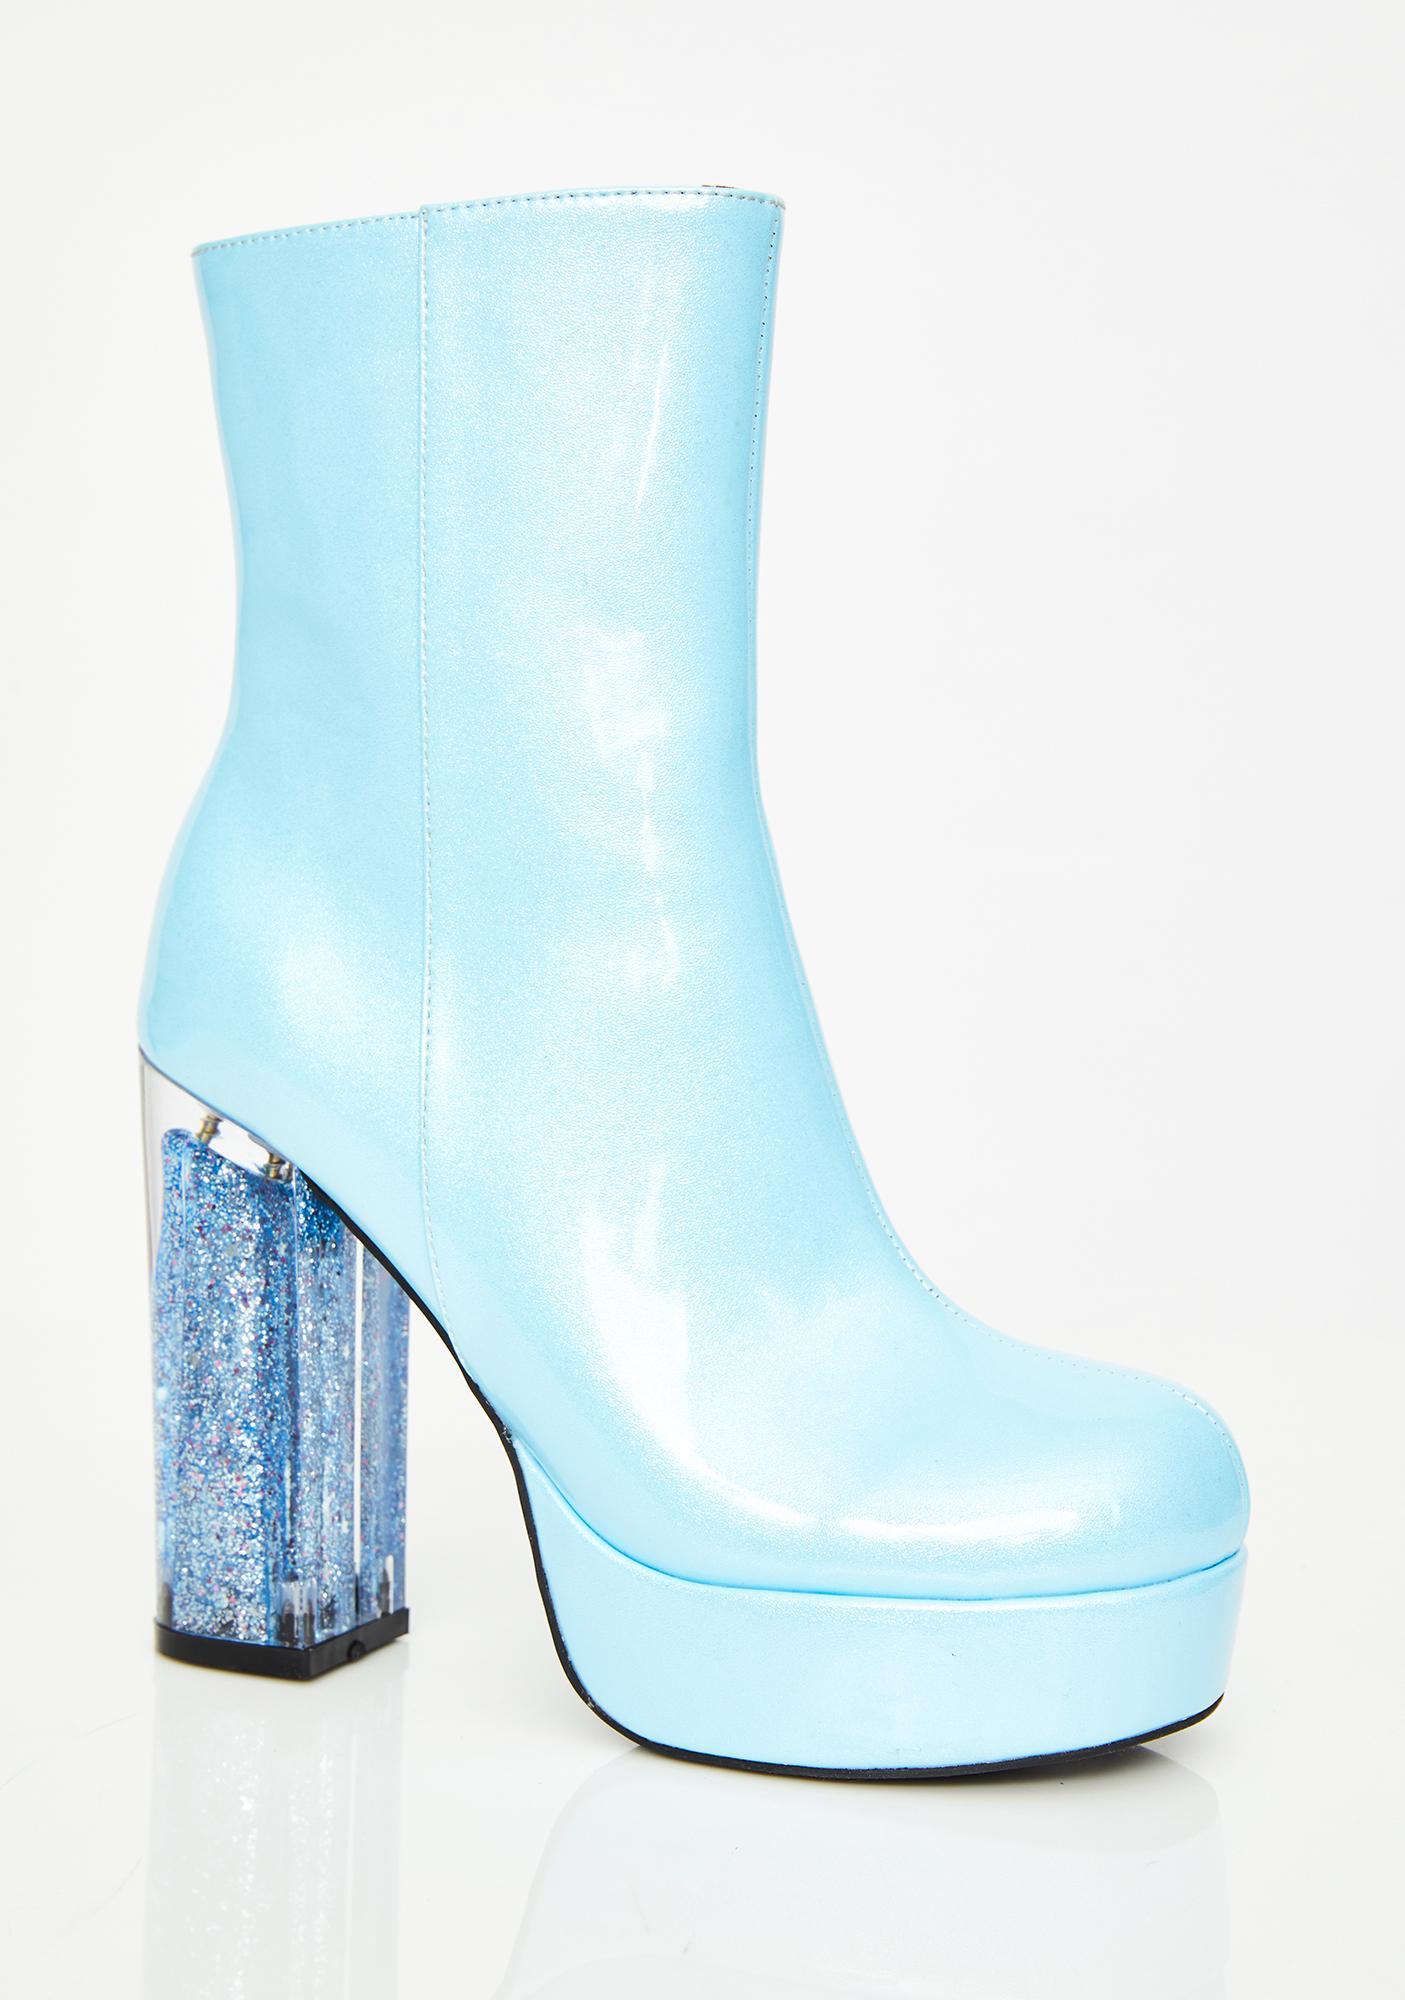 HOROSCOPEZ Age Of Aquarius Glitter Boots